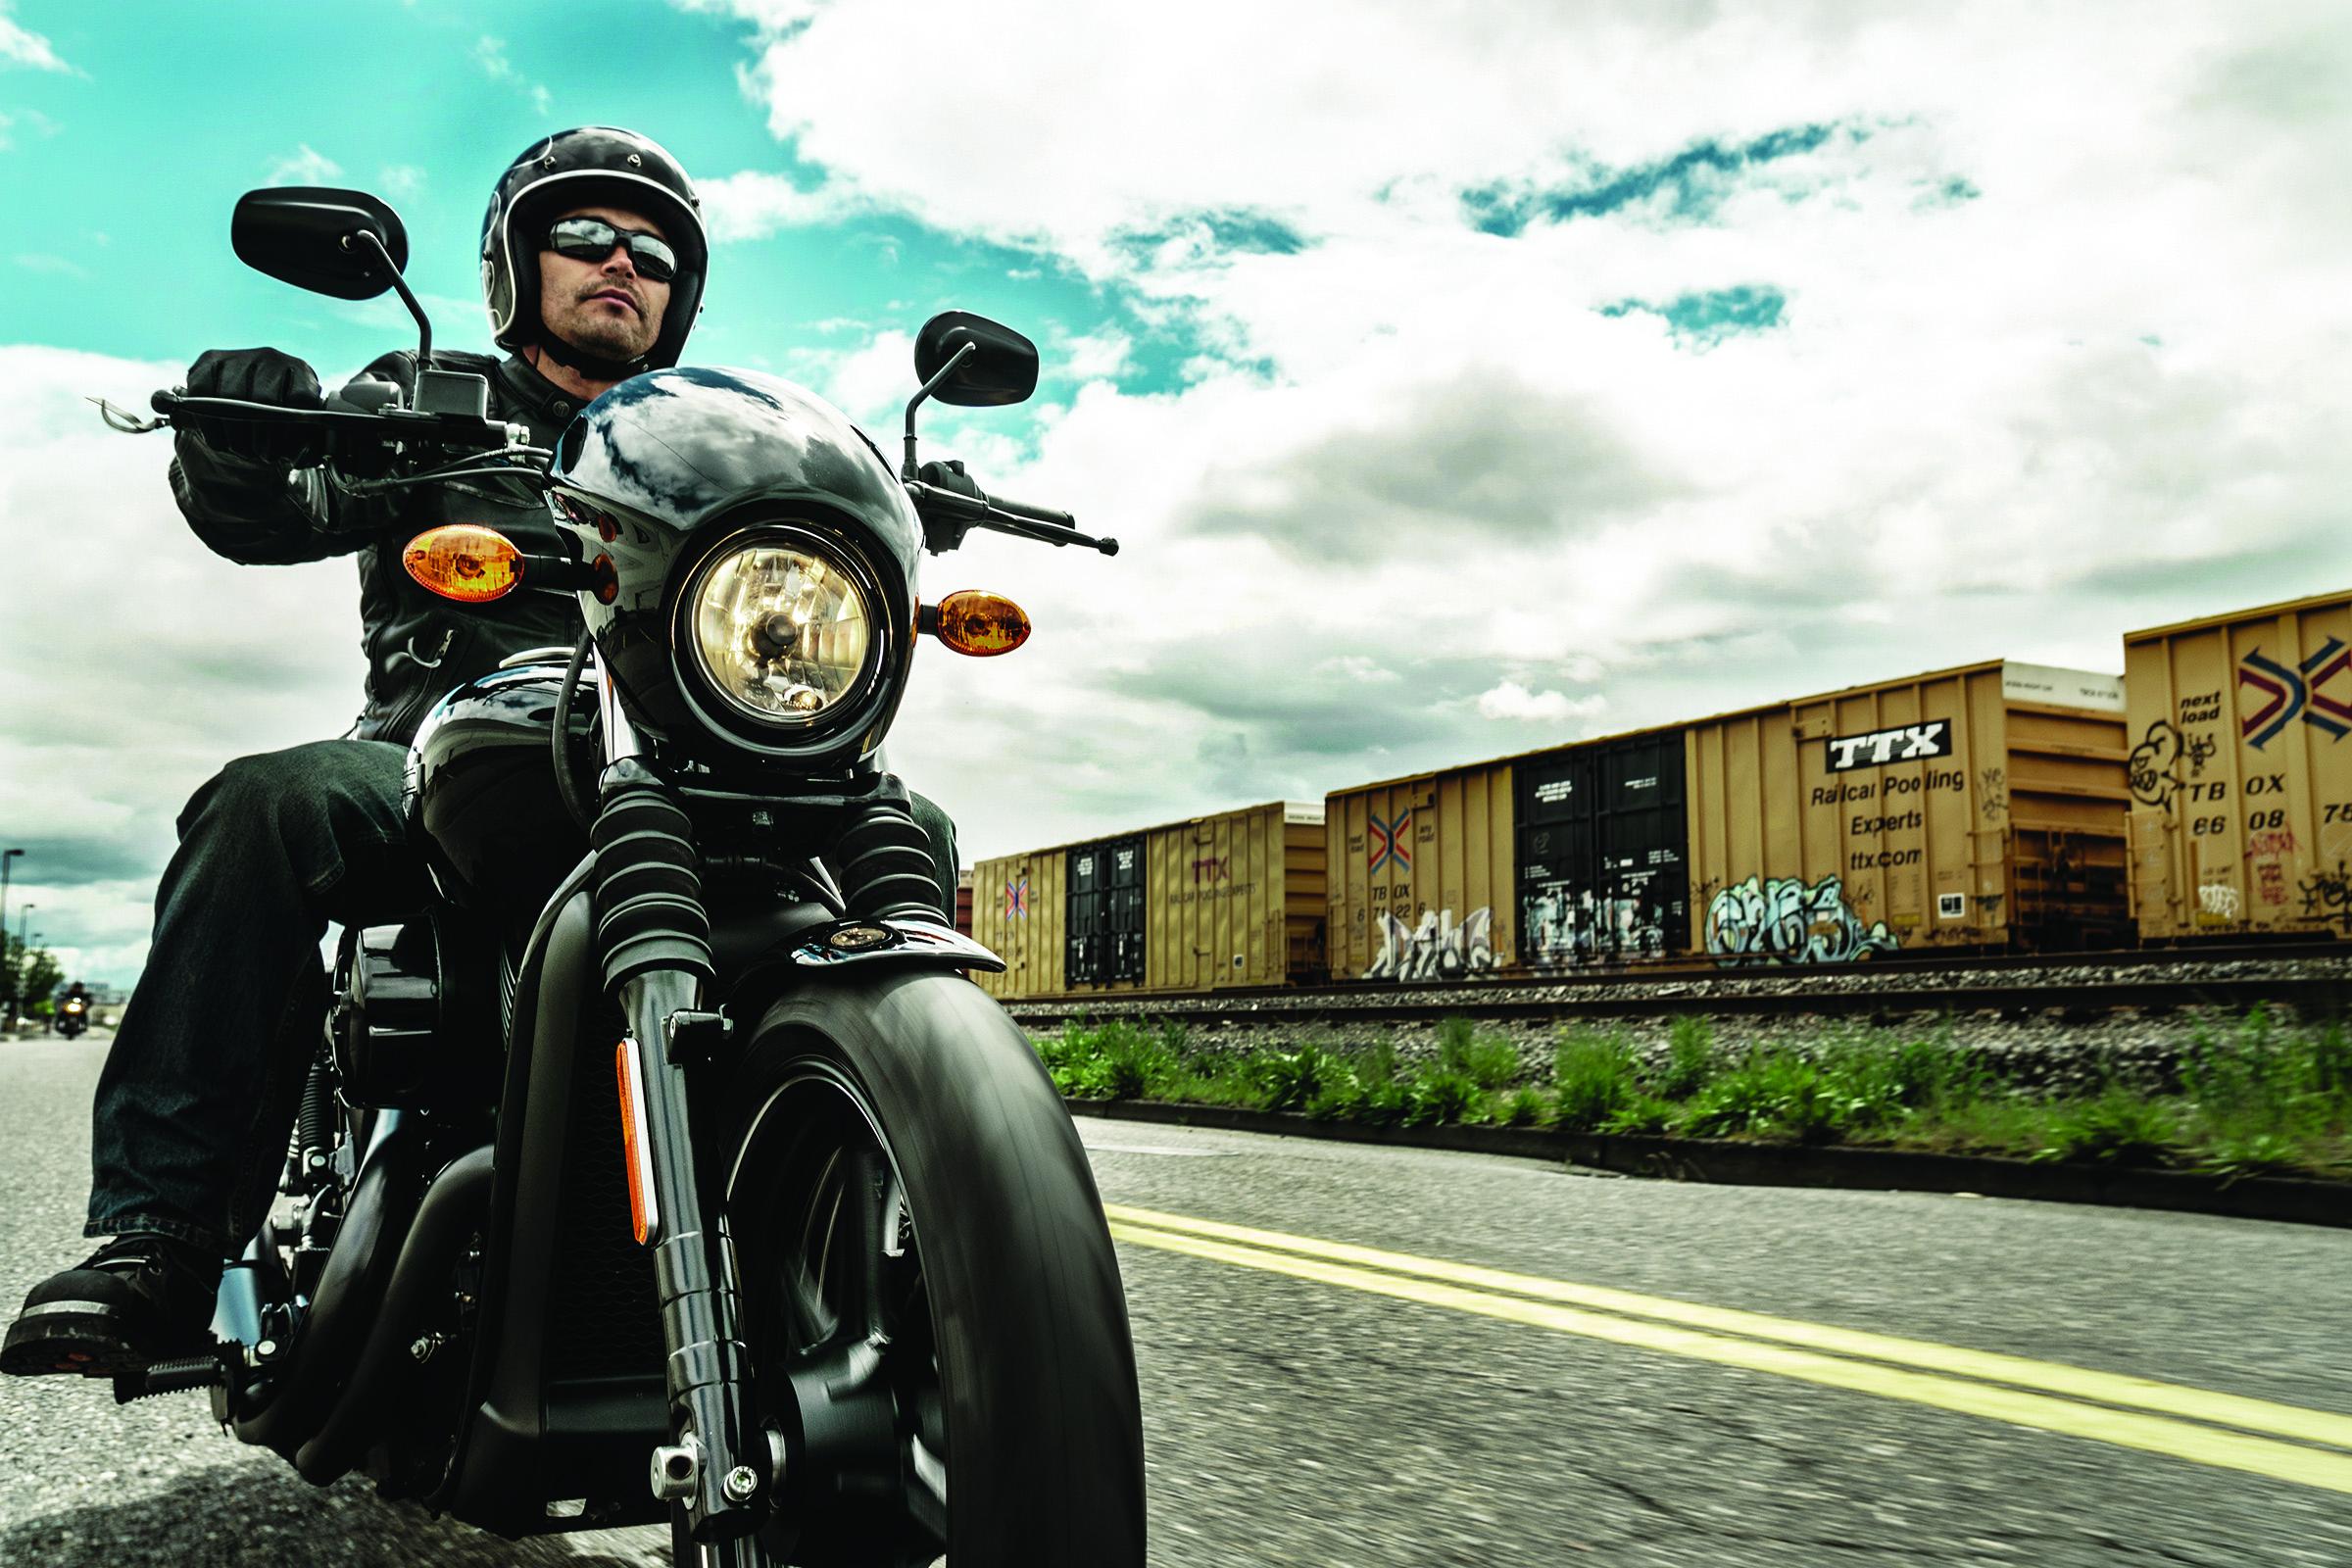 Man riding a Harley-Davidson motorcycle on street